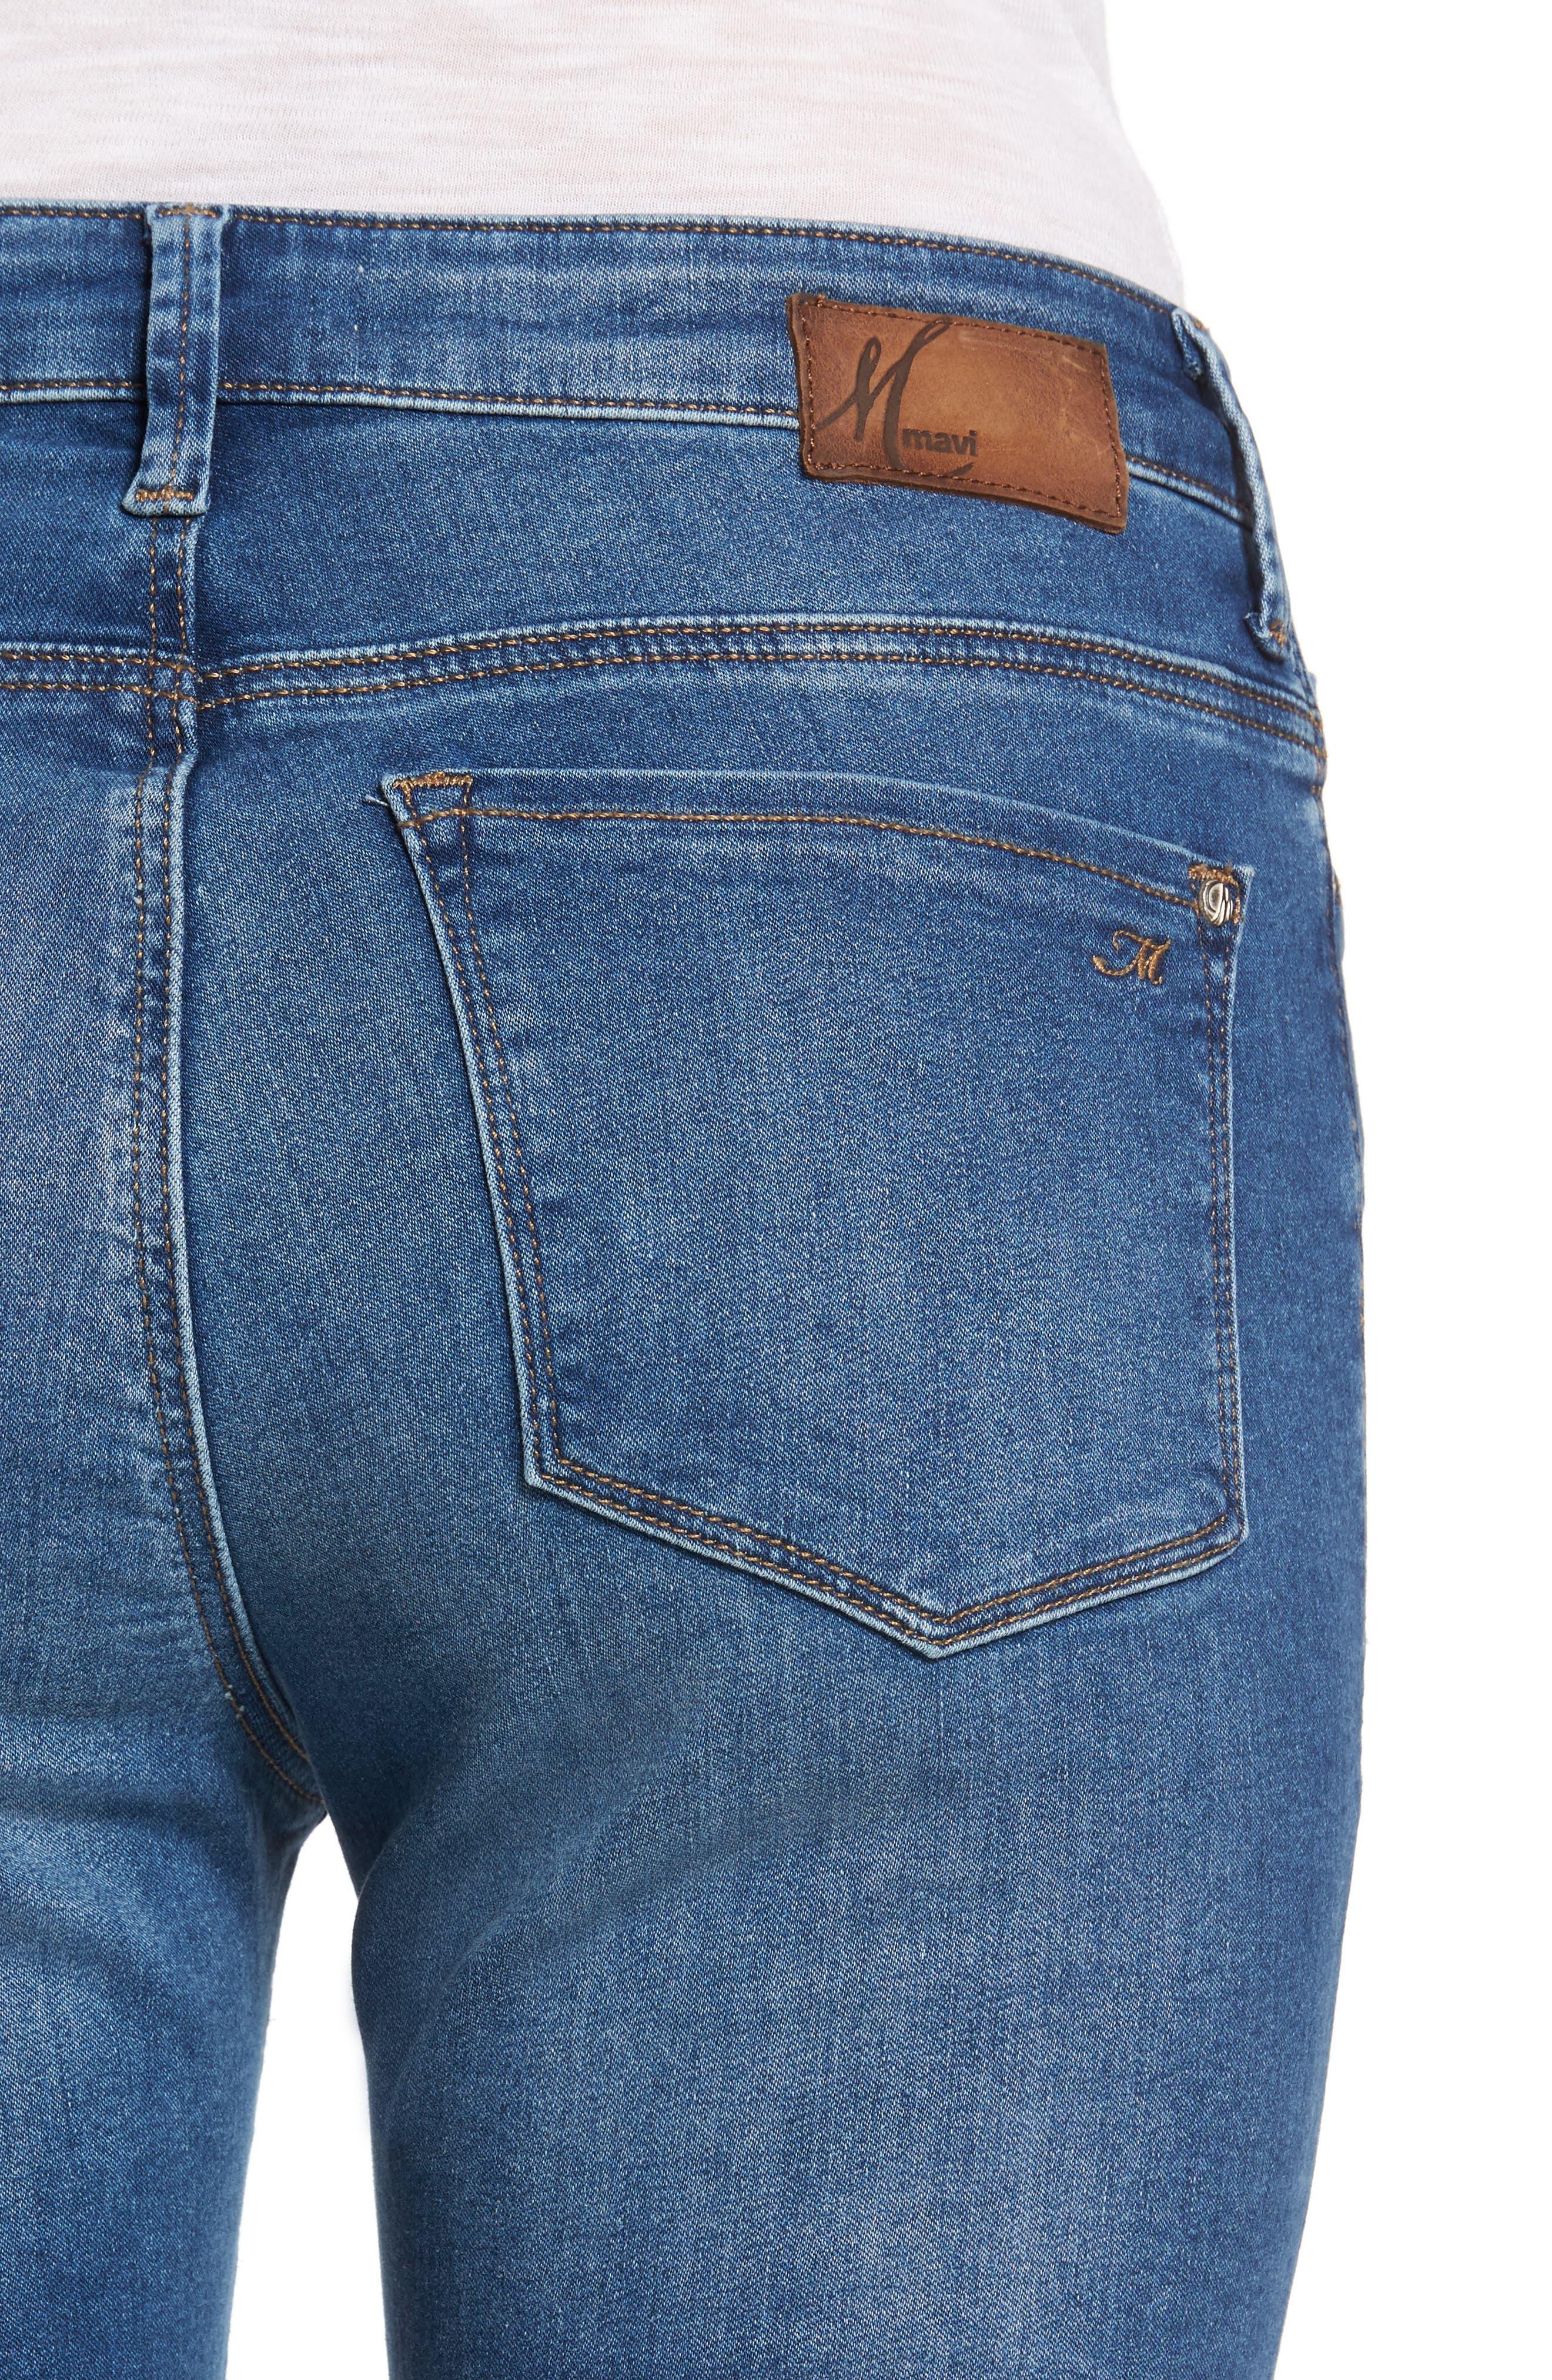 Alternate Image 4  - Mavi Jeans Kendra High Waist Stretch Denim Jeans (Mid Soft Shanti)